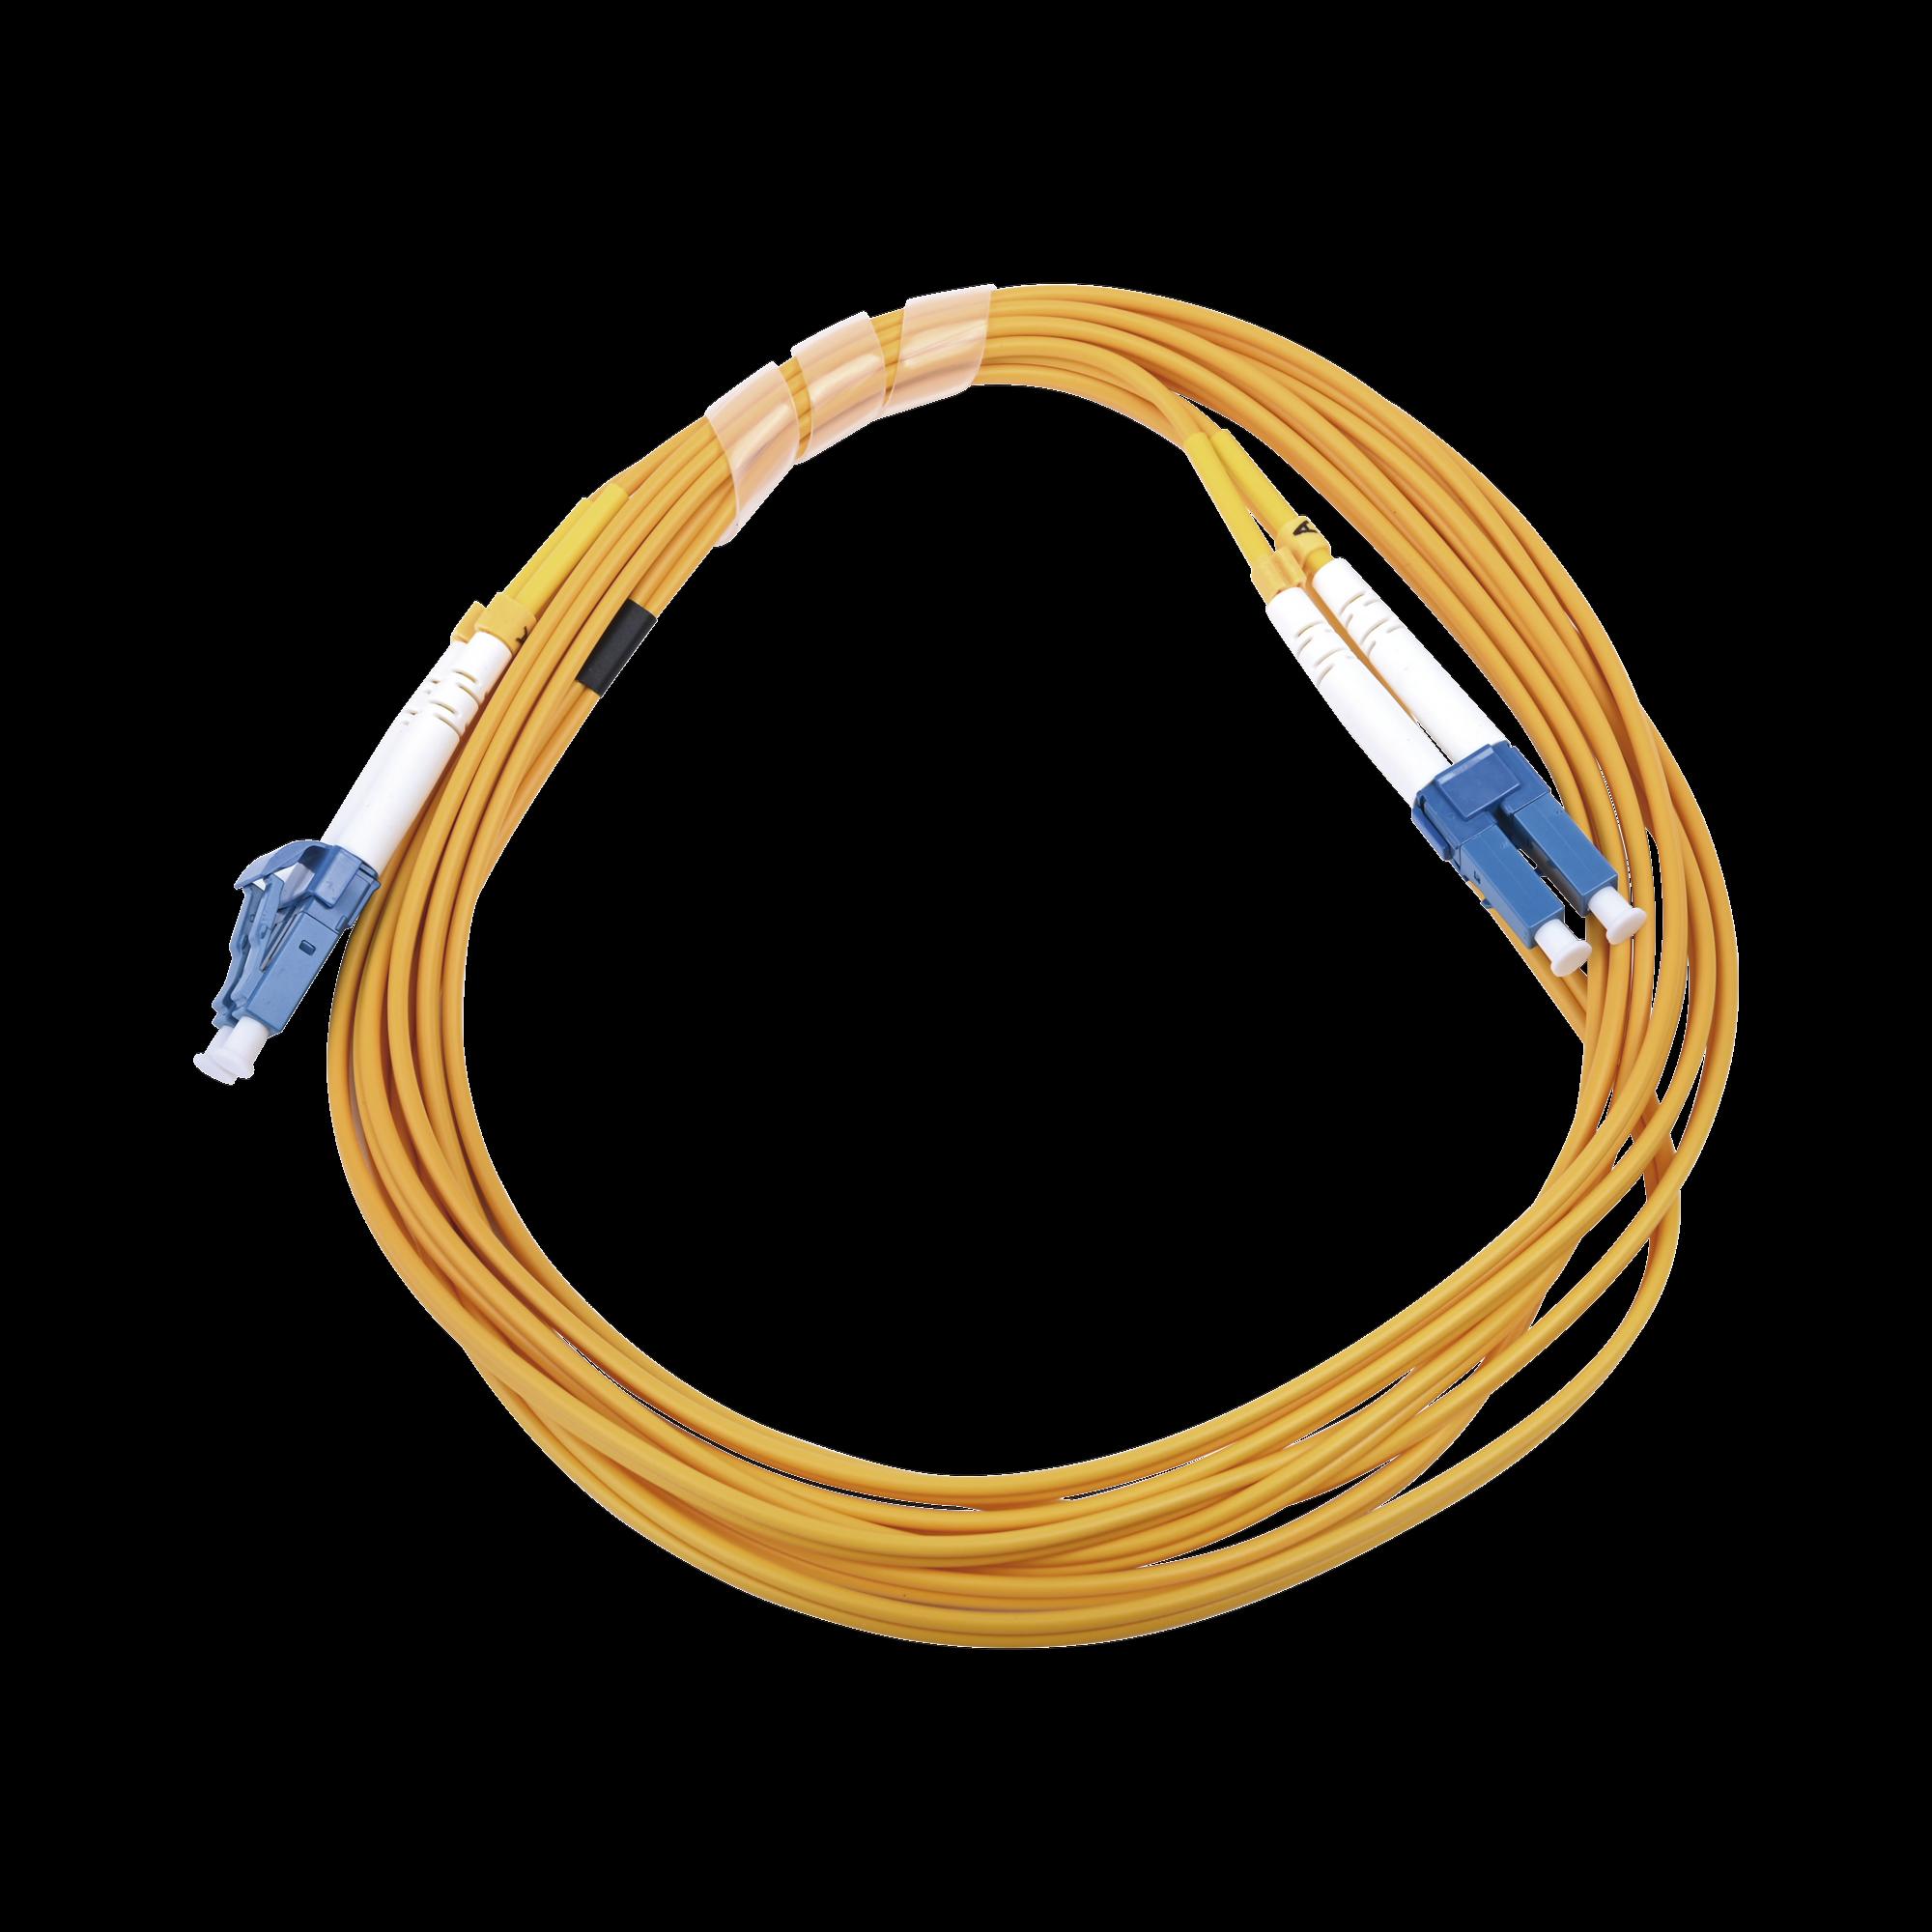 Jumper de Fibra óptica Monomodo 9/125 LC/UPC-LC/UPC, PVC, 2.0 mm, Dúplex, amarillo, 3 metros